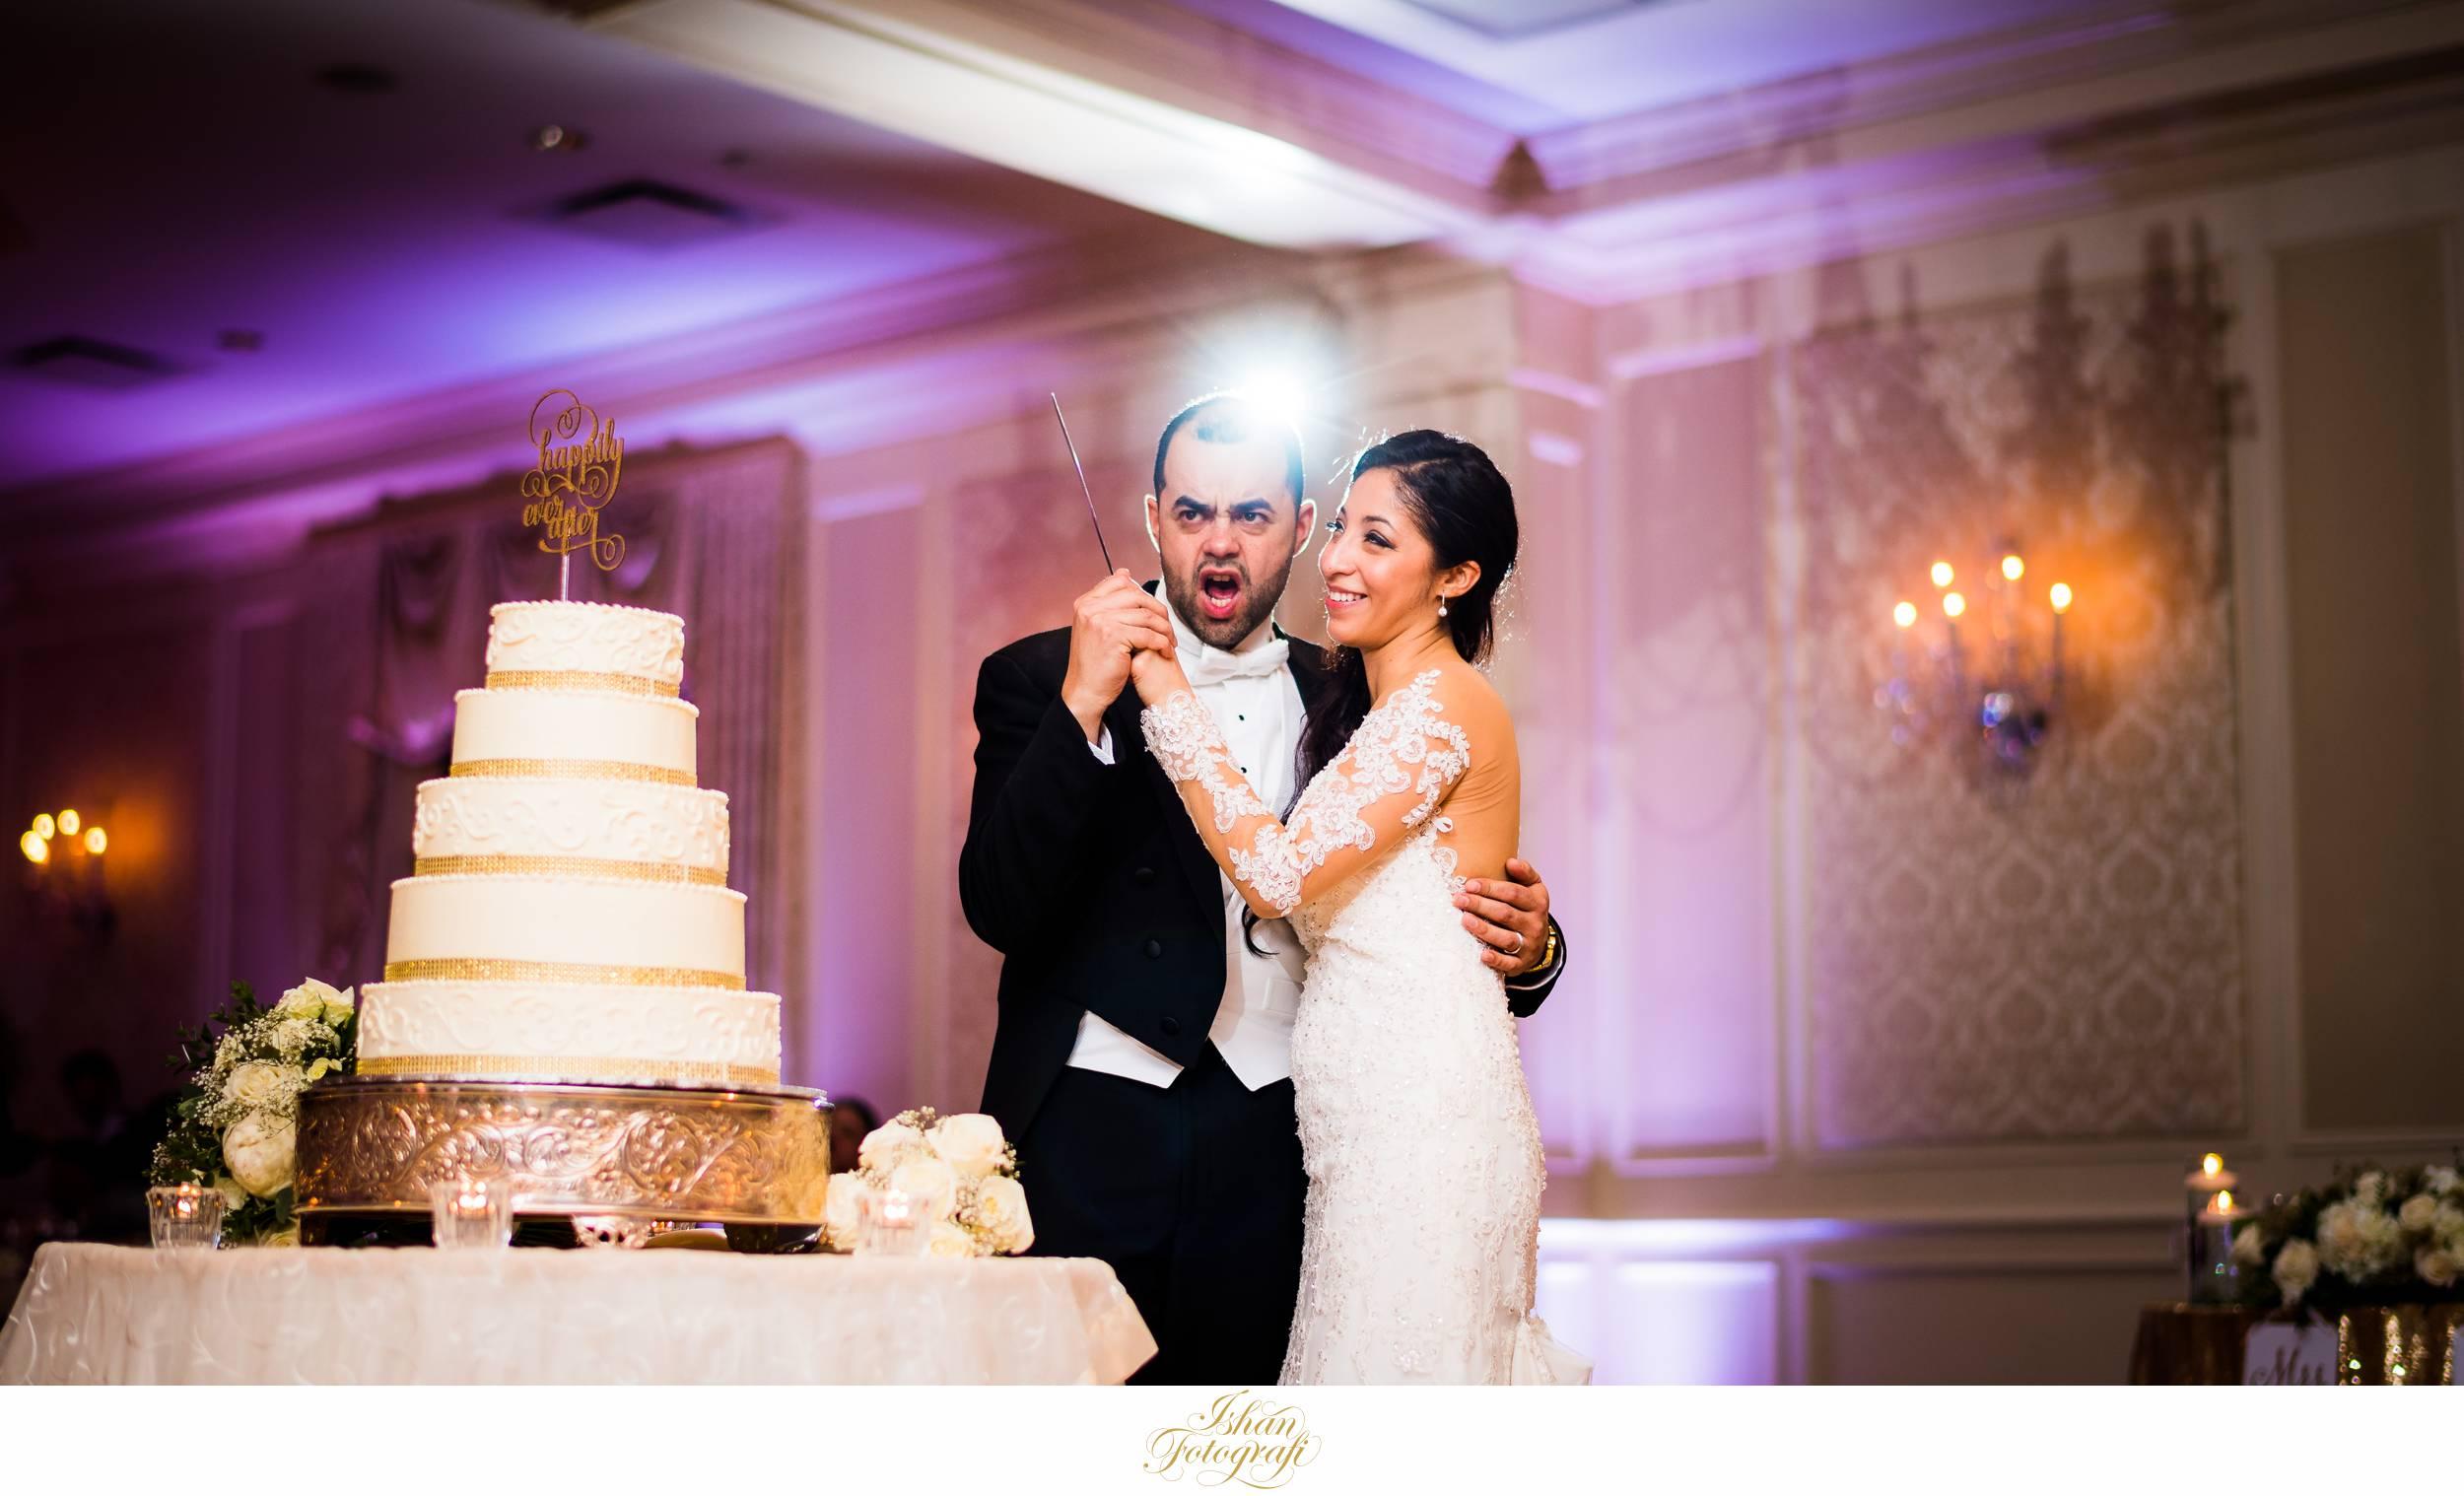 wedding-cake-meadow-wood-manor-randolph-nj